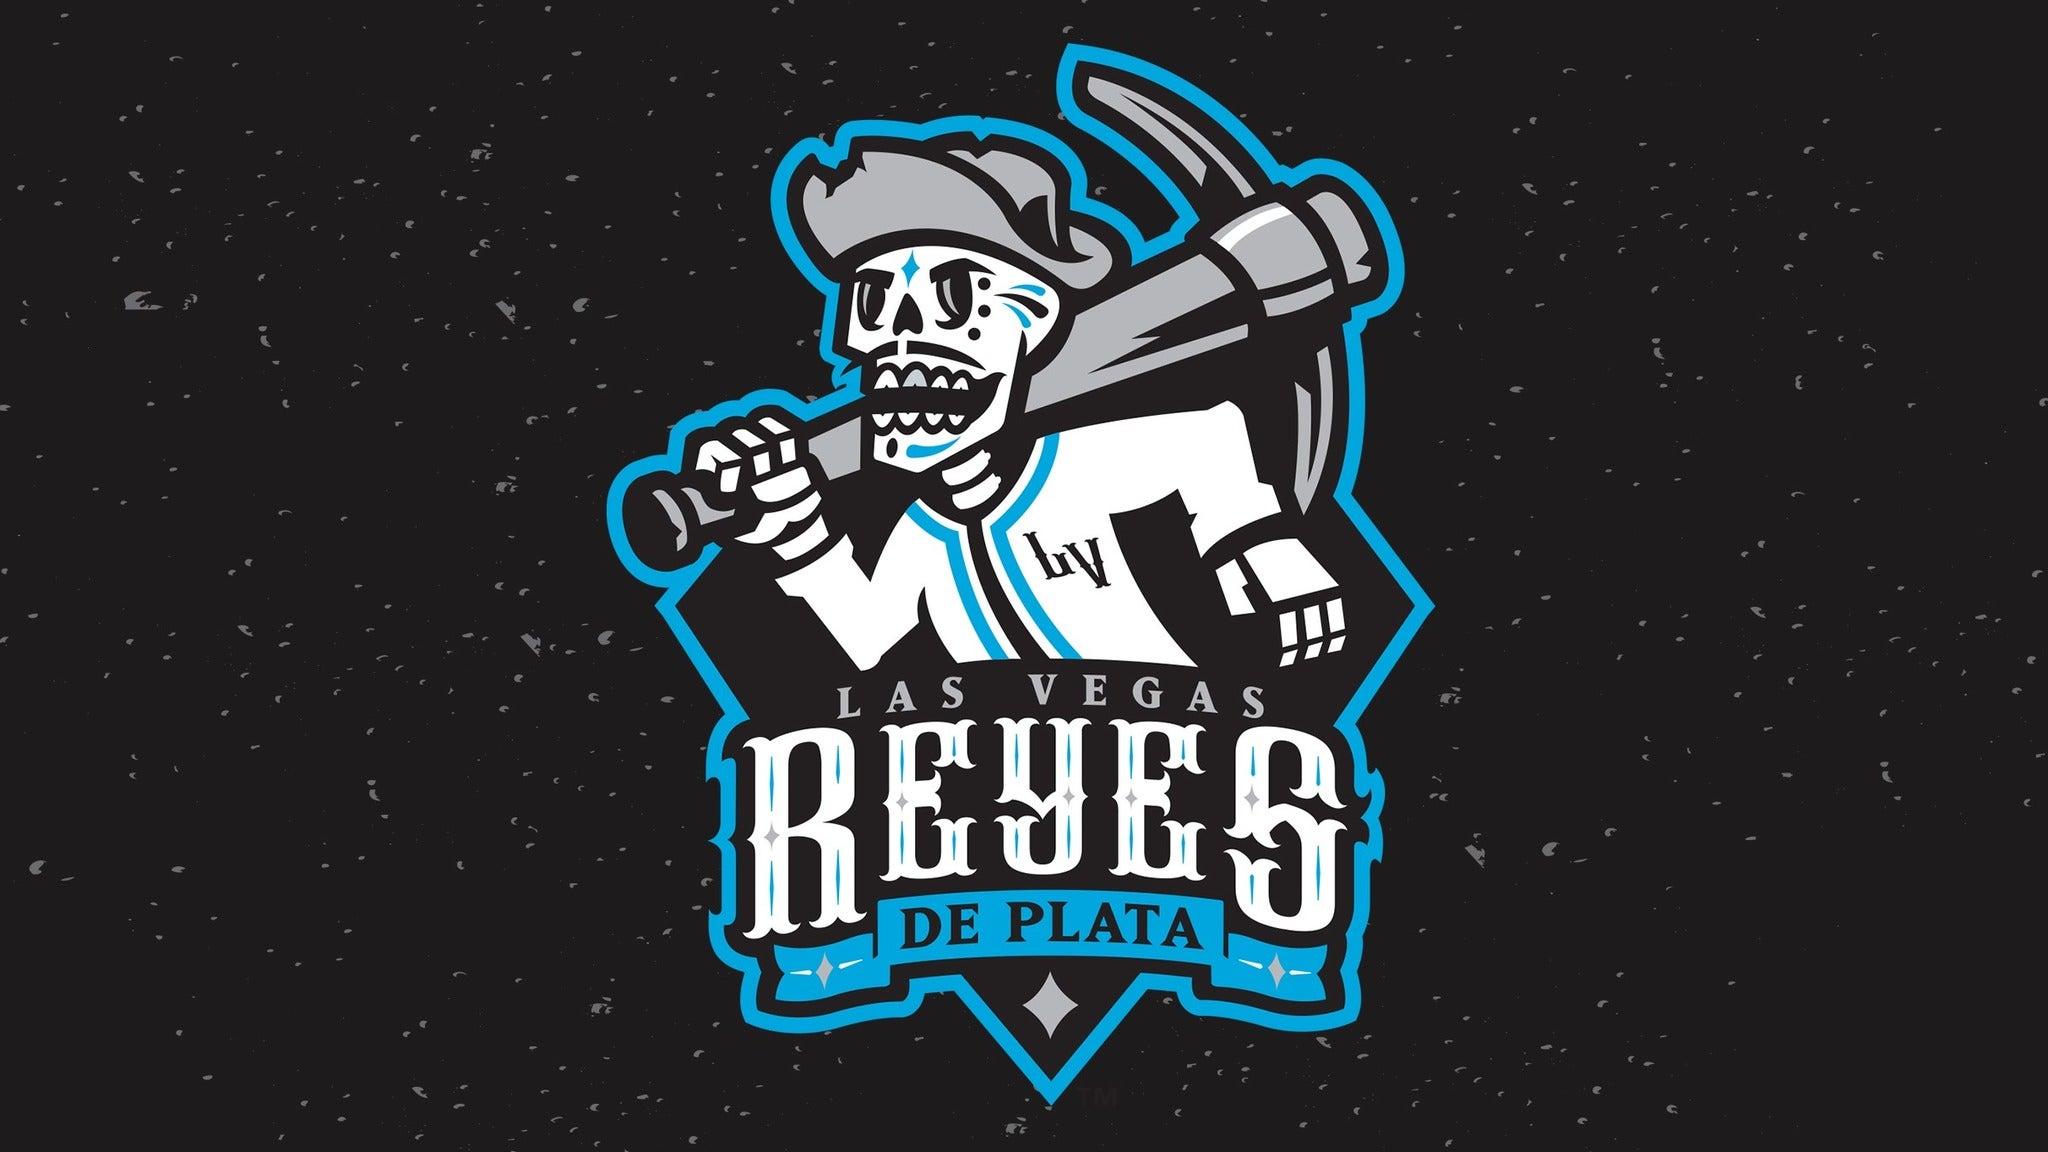 Las Vegas Reyes de Plata vs. Reno Aces at Las Vegas Ballpark